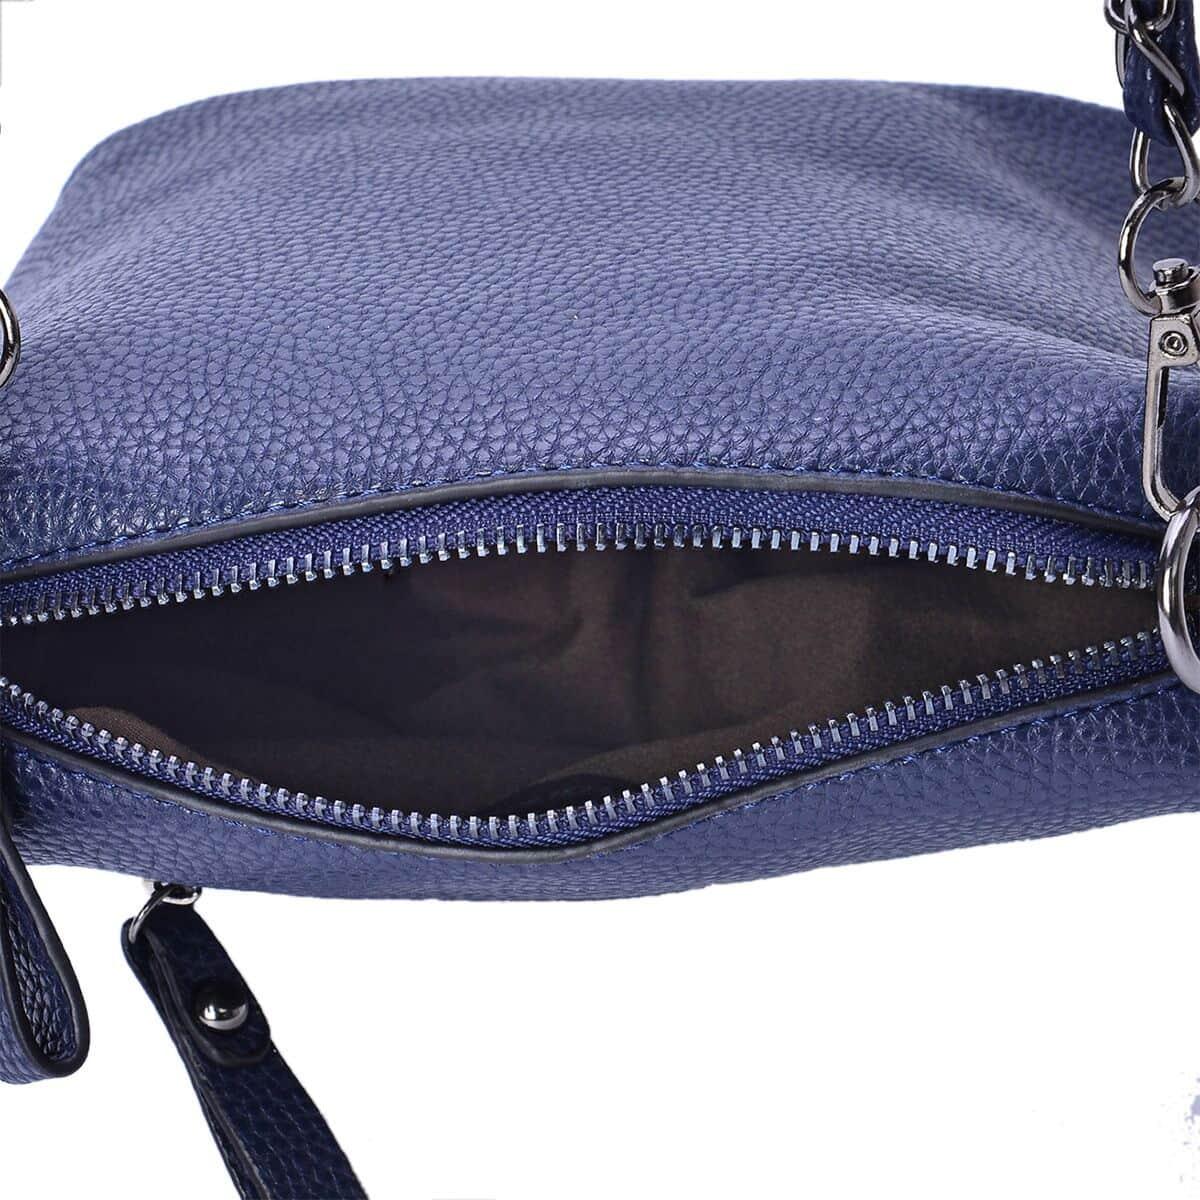 J Francis - Blue Faux Leather Crossbody Bag (8x4x8 in)